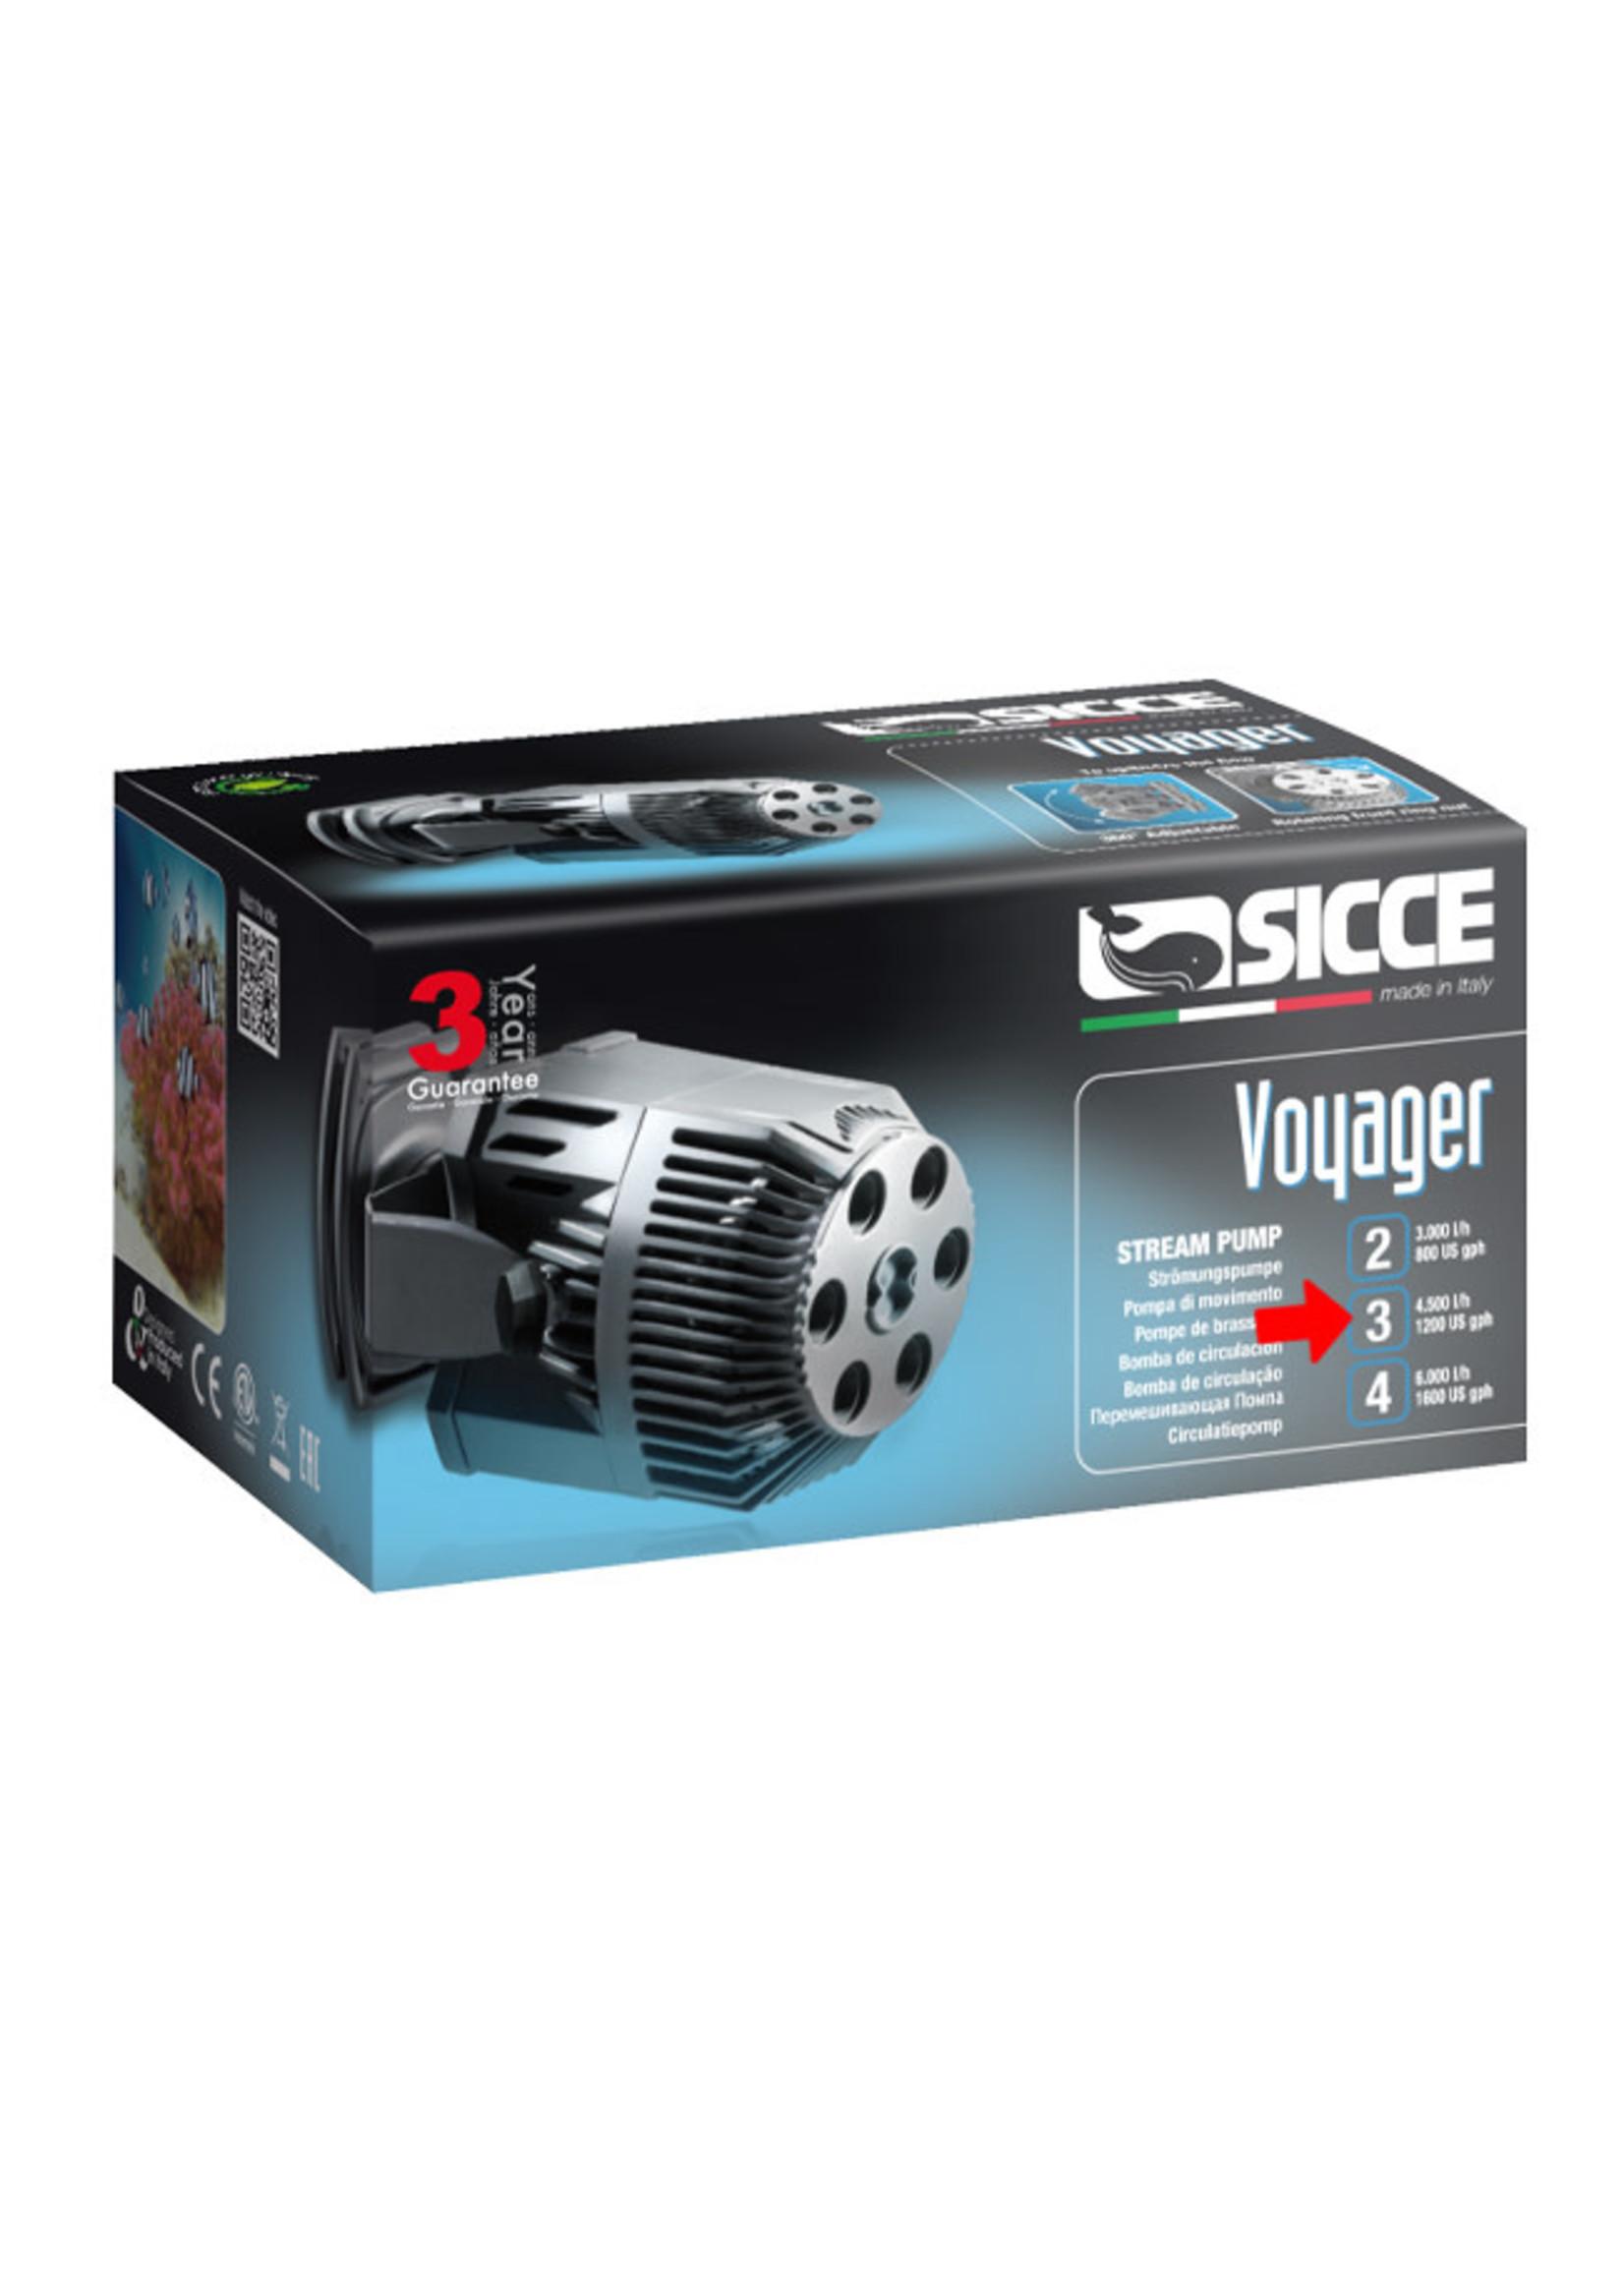 SICCE US, Inc. Sicce Voyager Stream Pump 3, 1200gph